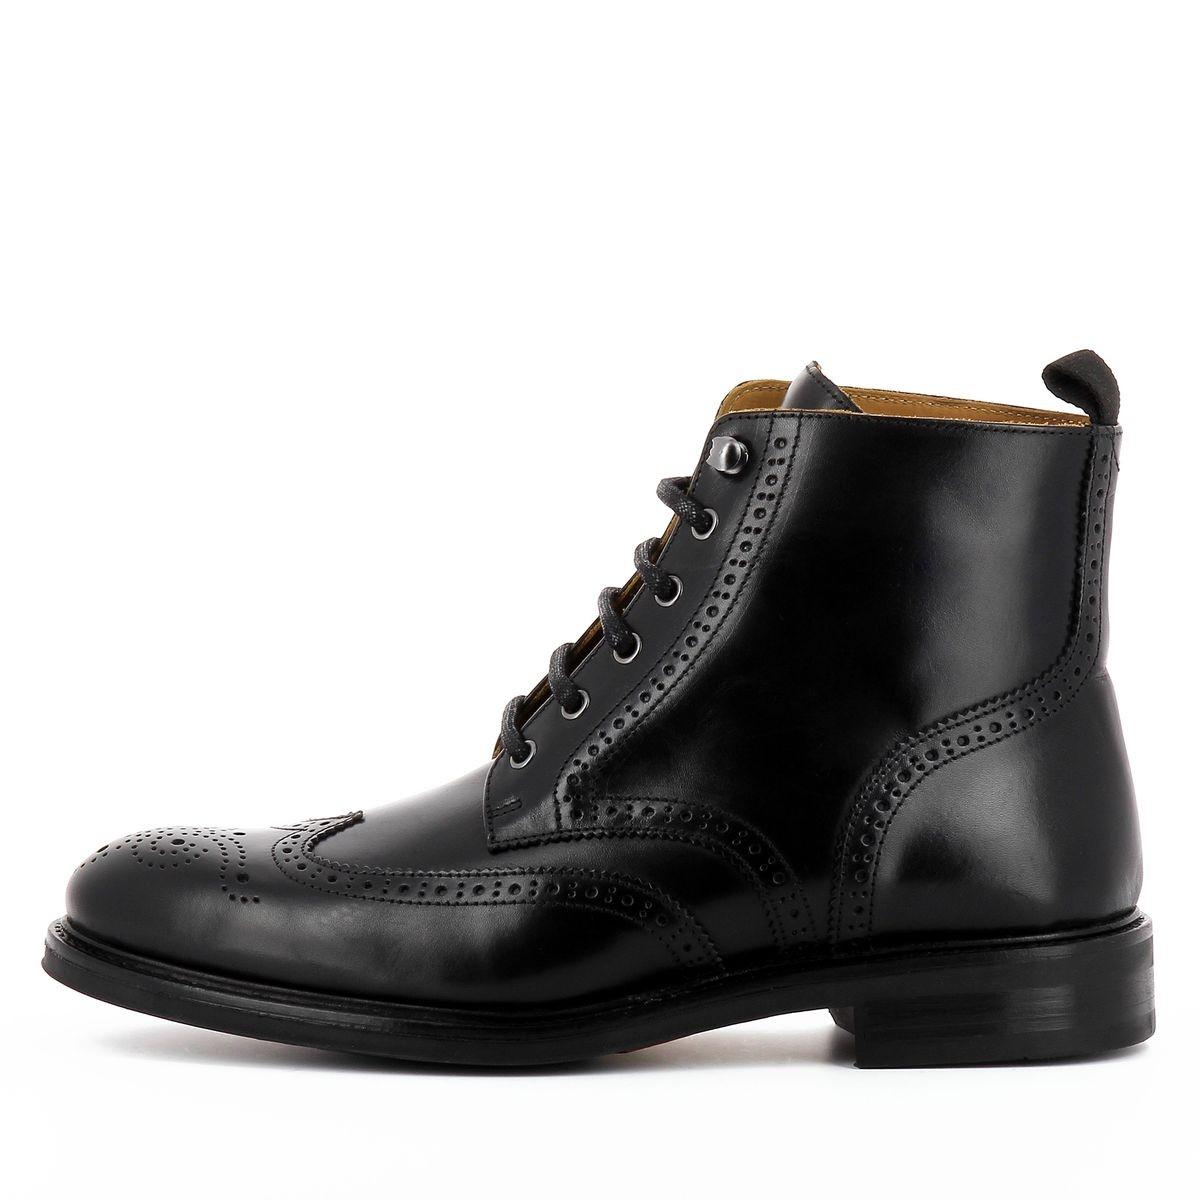 Bottine Homme Taille : 41 | shoes en 2019 | Bottines homme